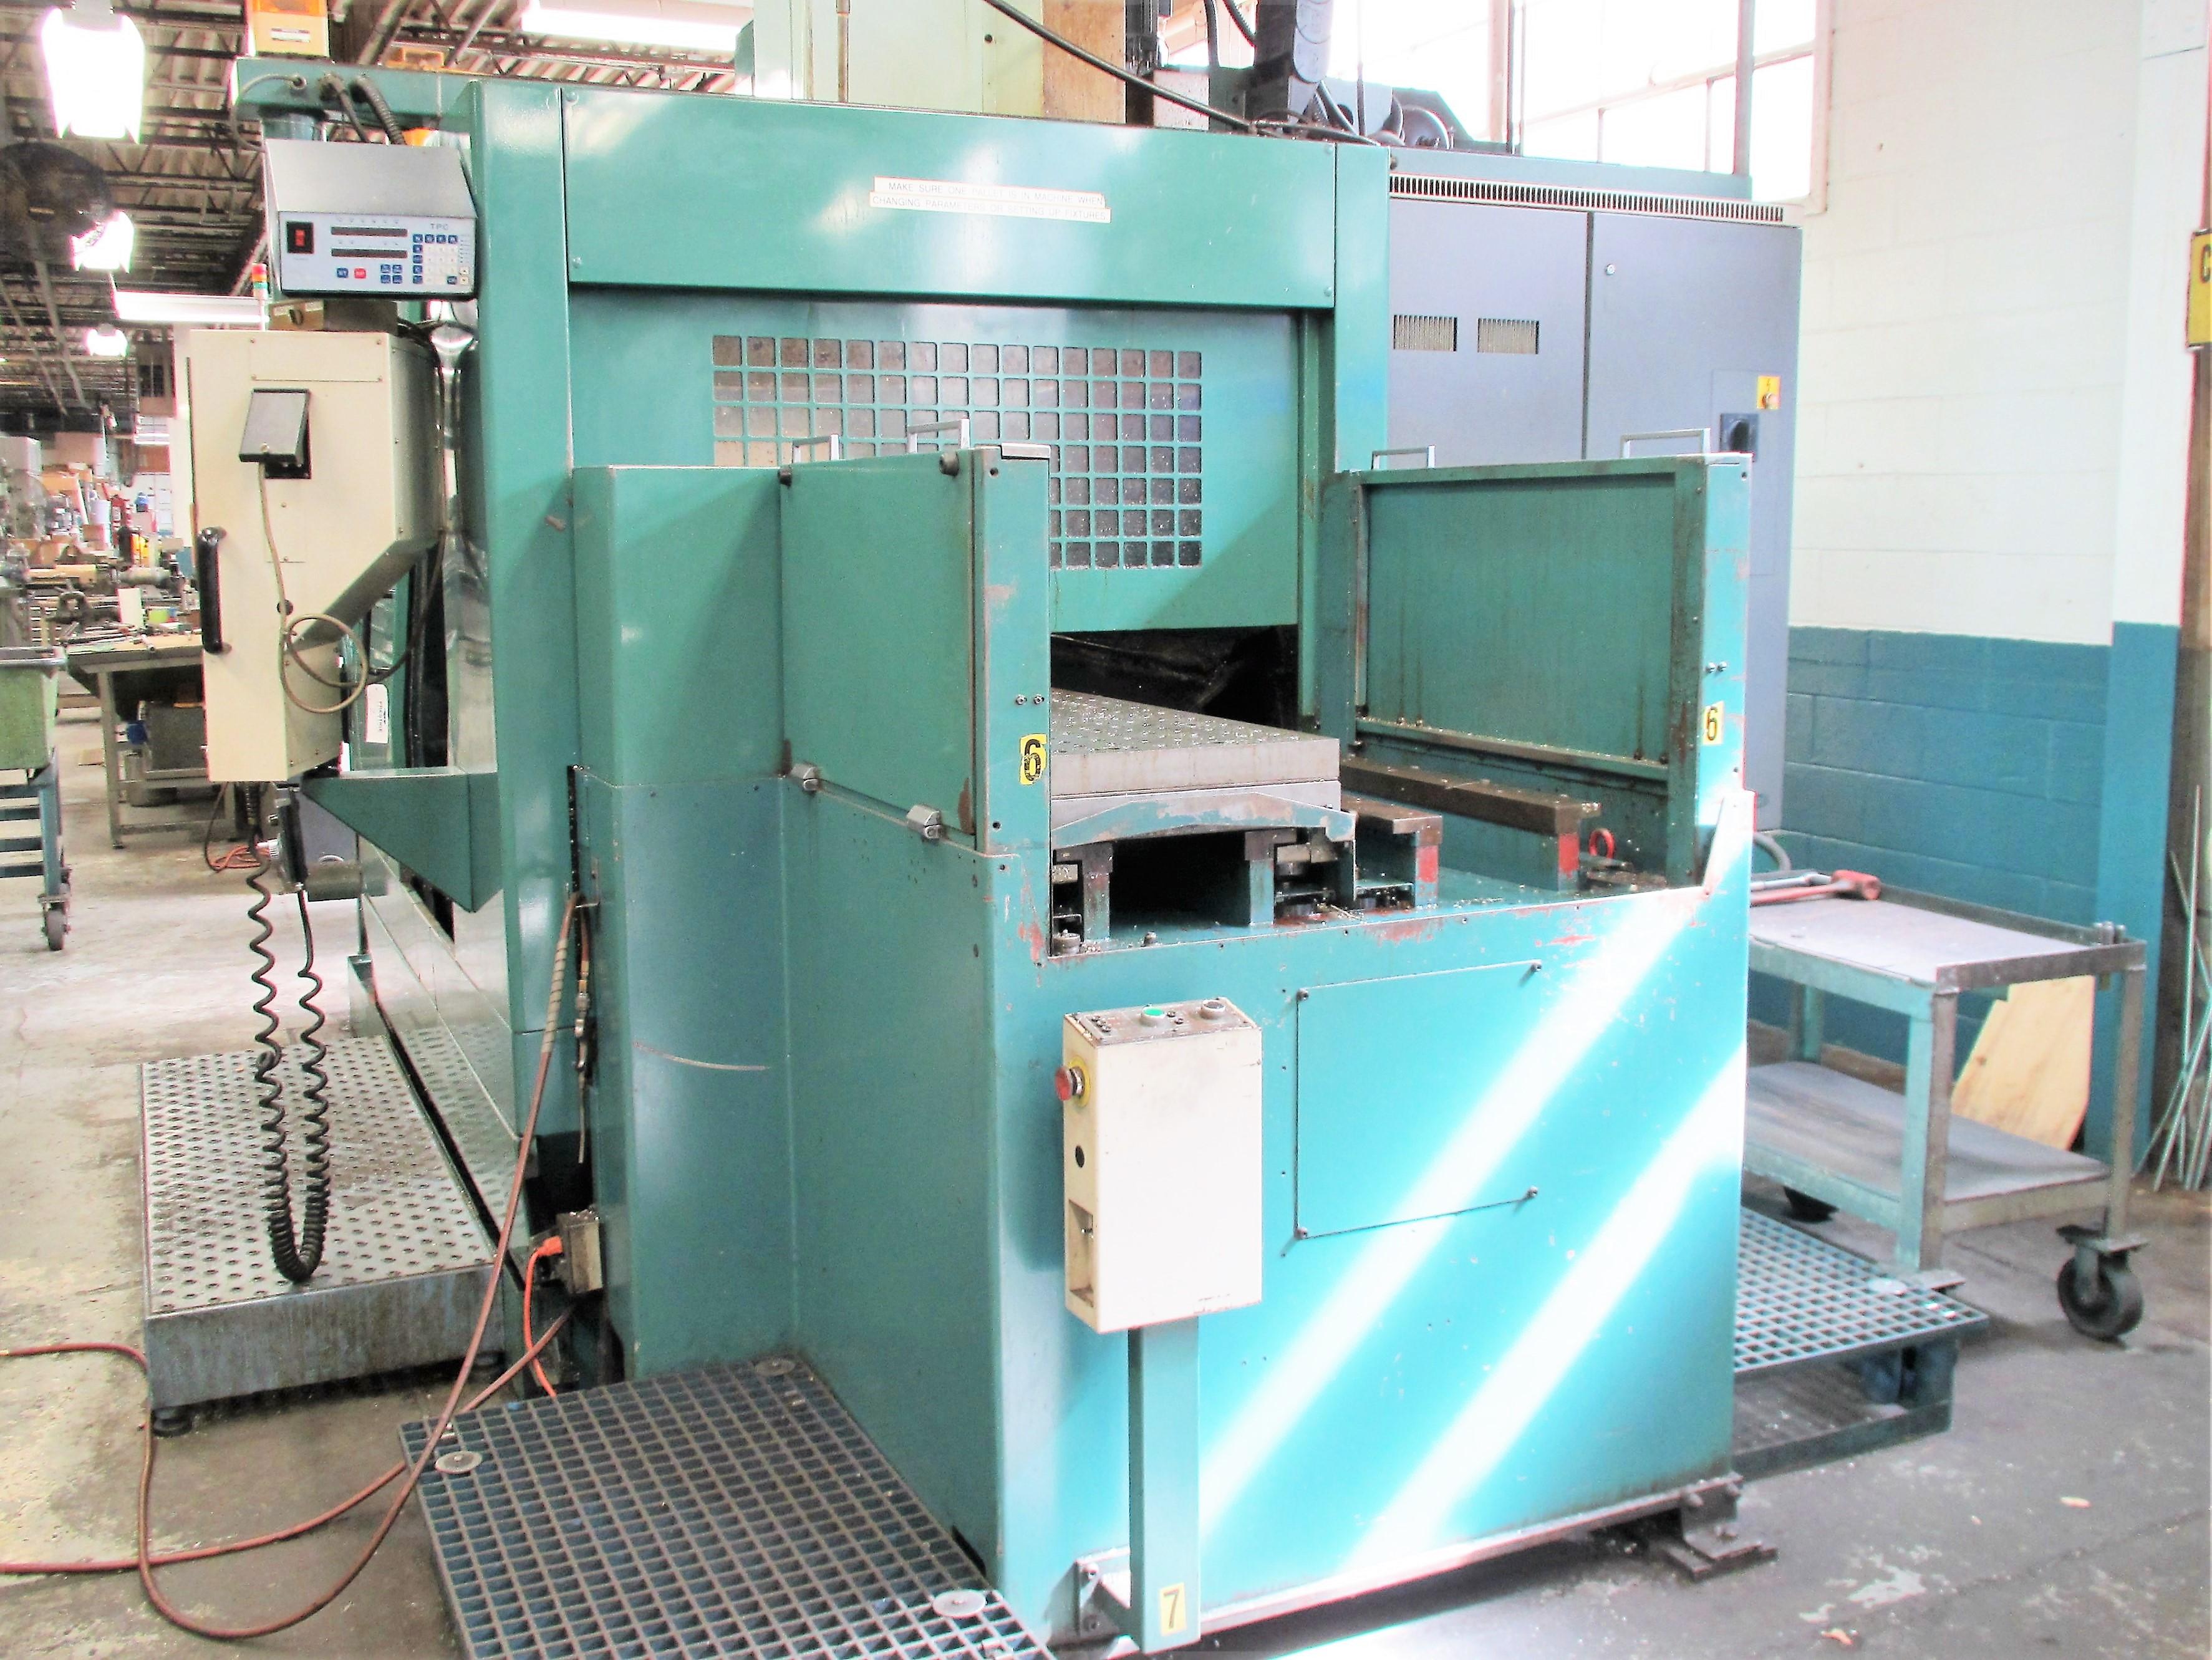 MATSUURA RA-4F CNC VERTICAL MACHINING CENTER WITH APC - Image 6 of 12